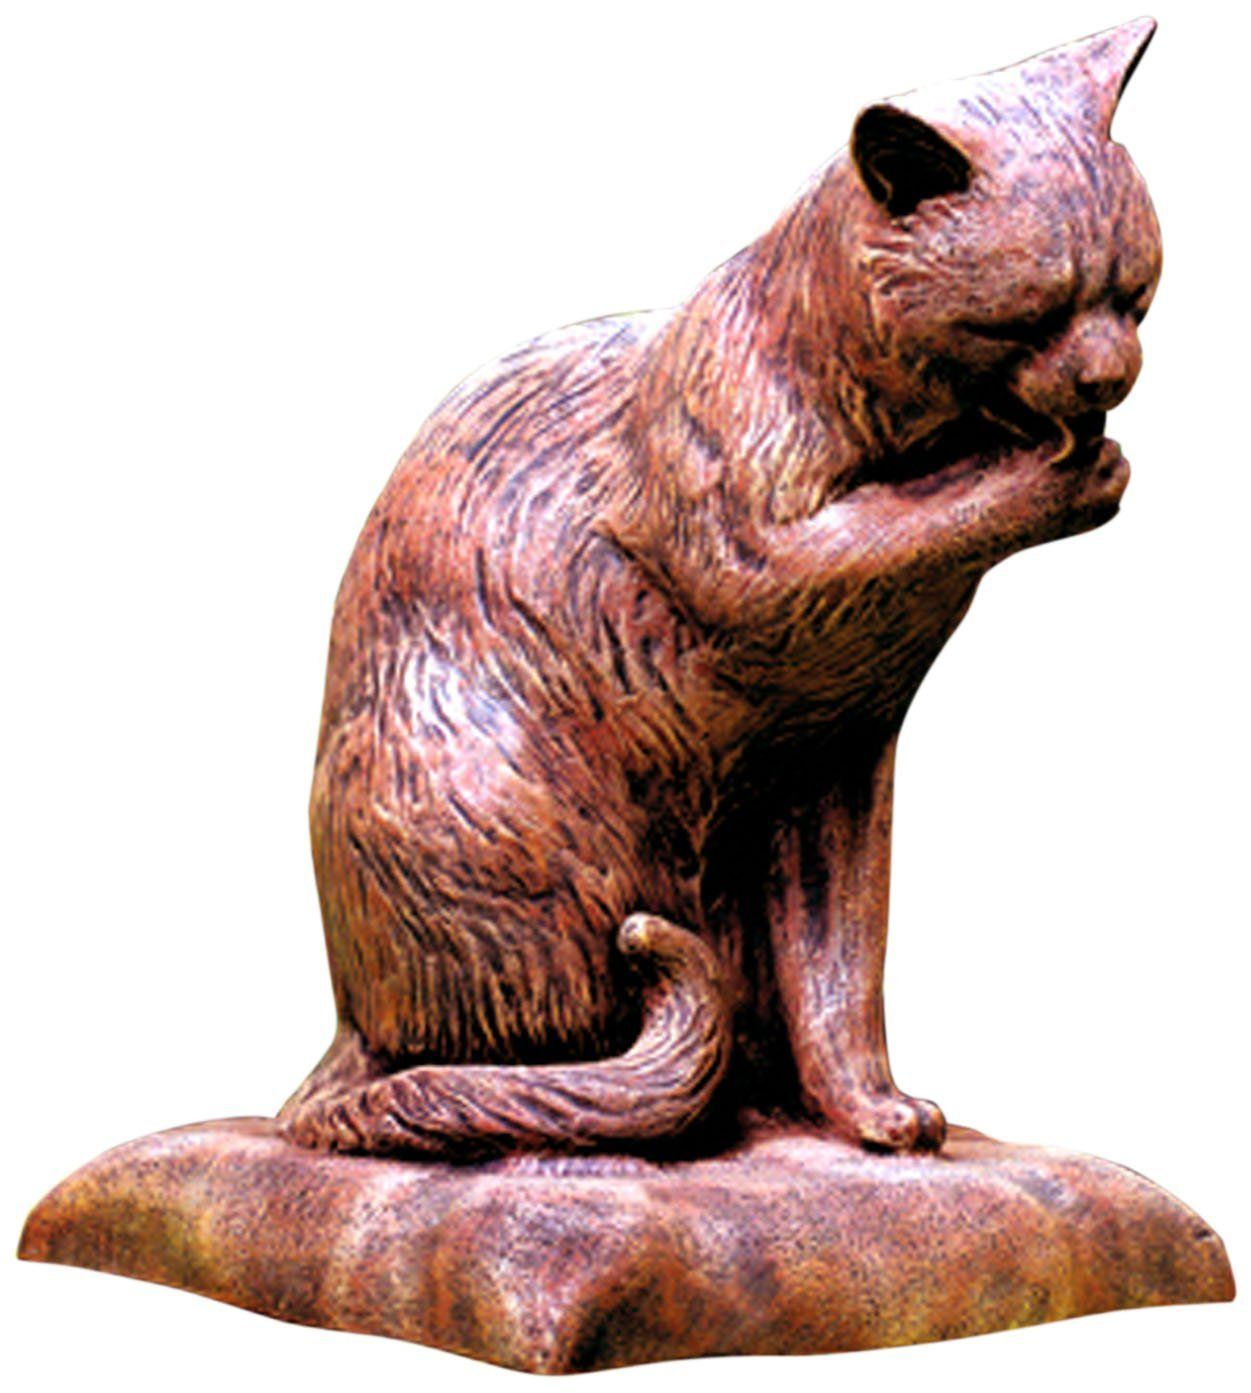 Amazon.com : LadyBug Cat Licking Paw Outdoor Statue, Brick : Patio, Lawn